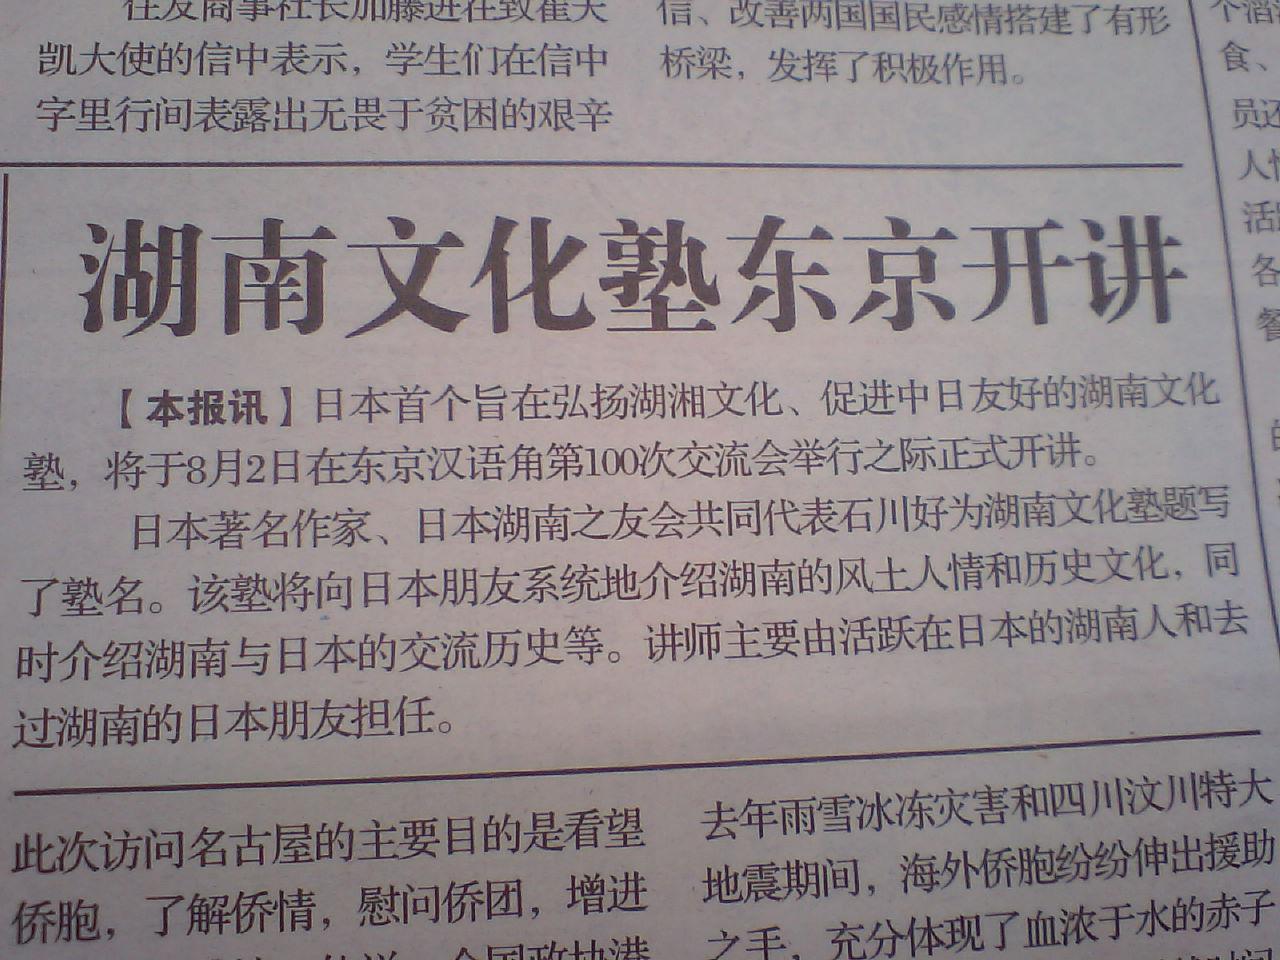 湖南文化塾8月2日開講のニュース 華風新聞17日号_d0027795_1318438.jpg